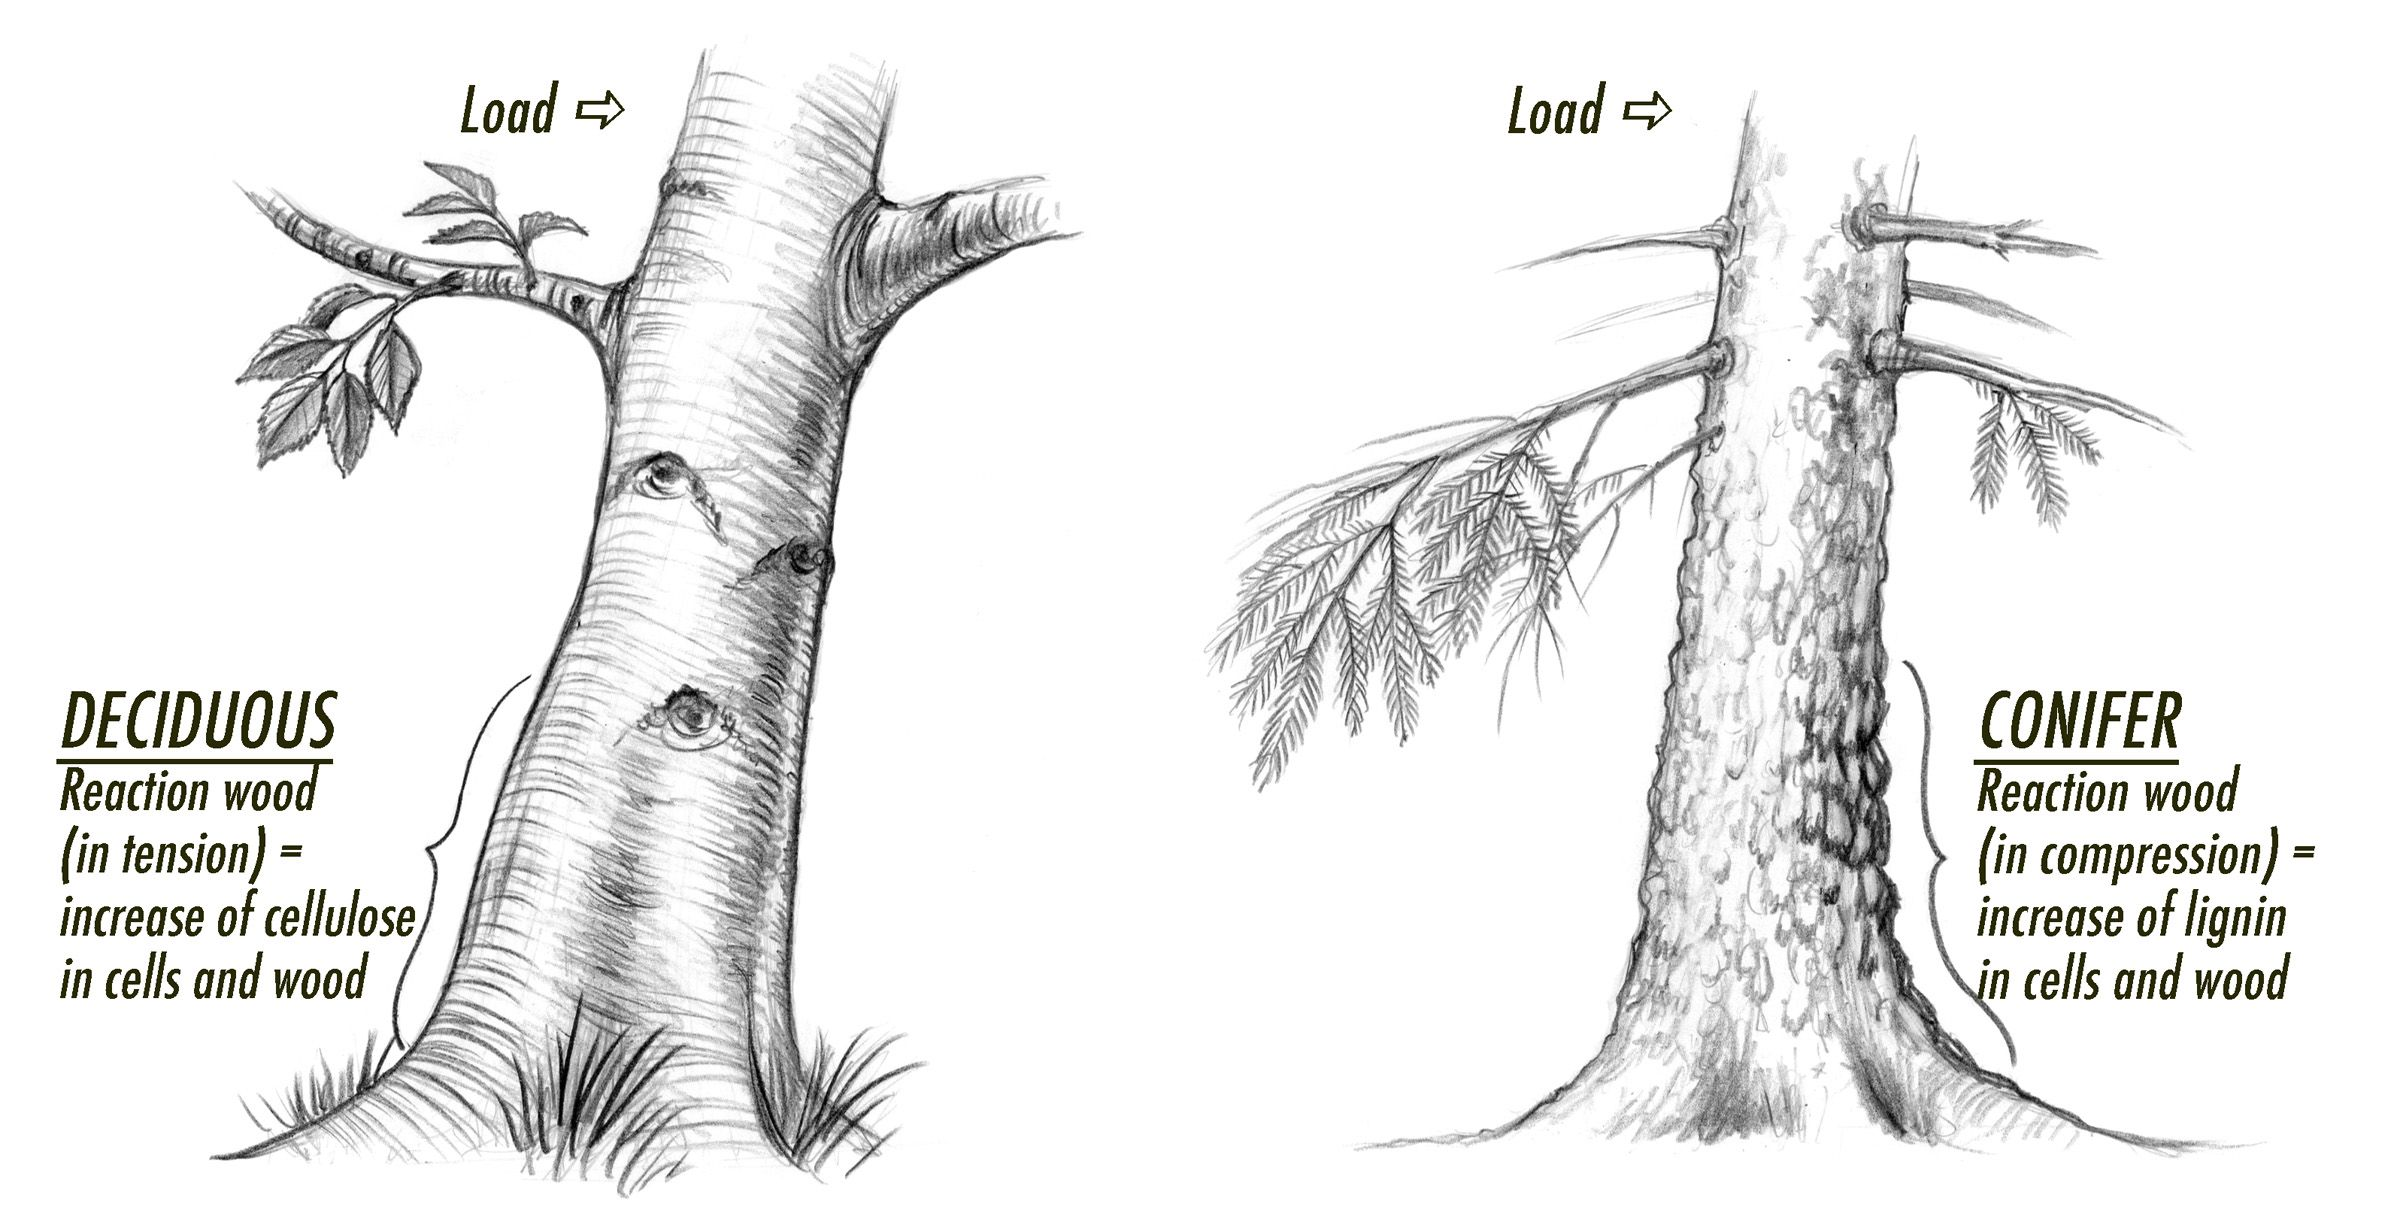 ficus bonsai tree wiring